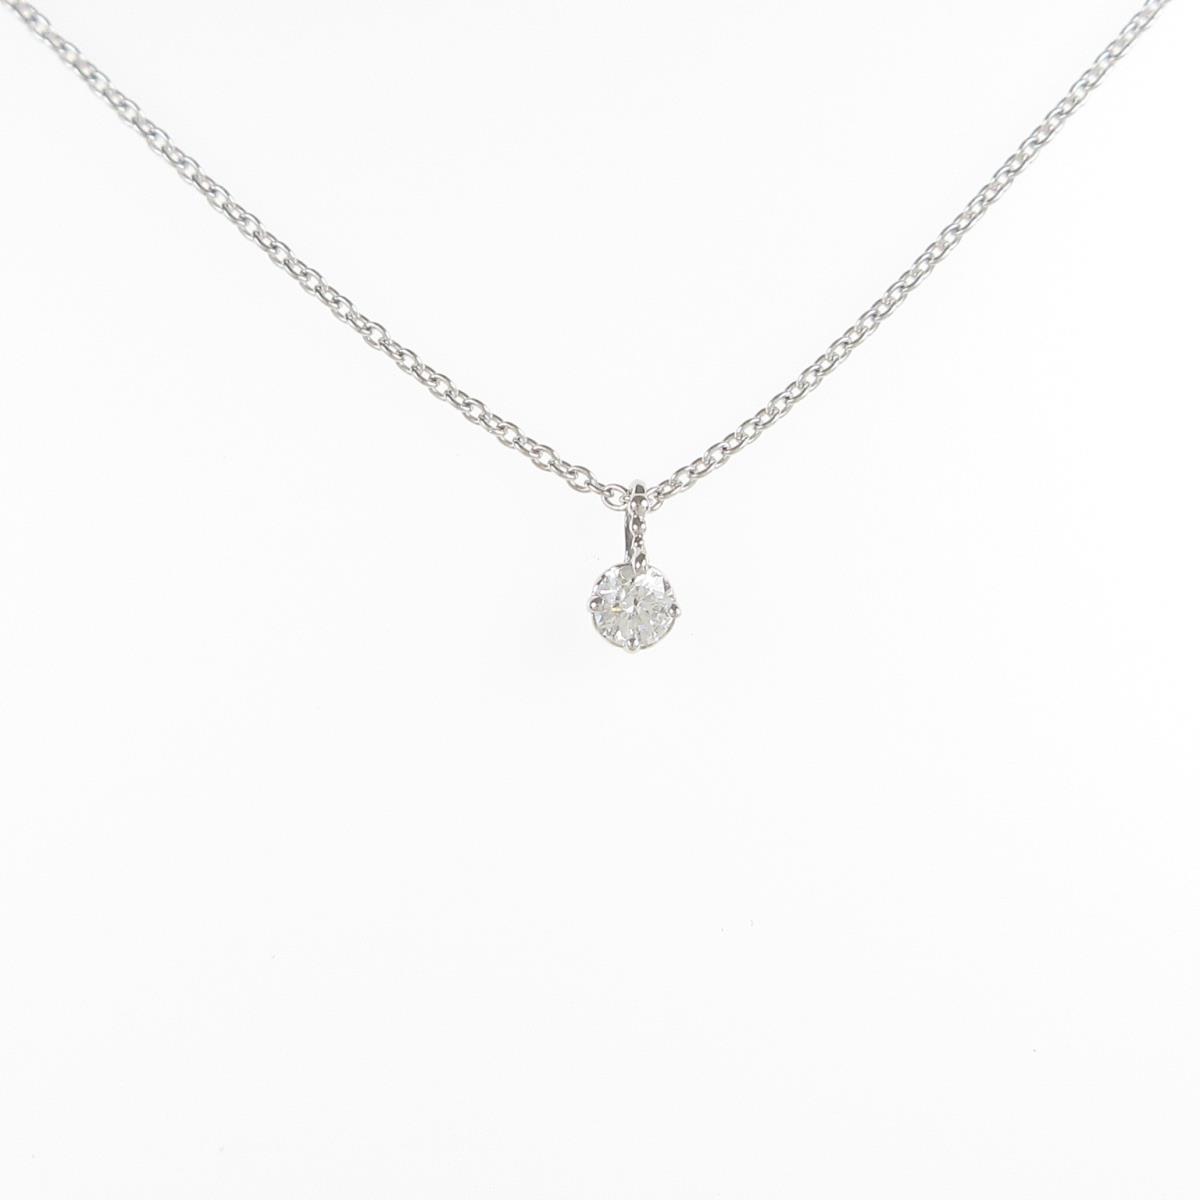 K18WG ソリティア セール特別価格 中古 ダイヤモンドネックレス 上品